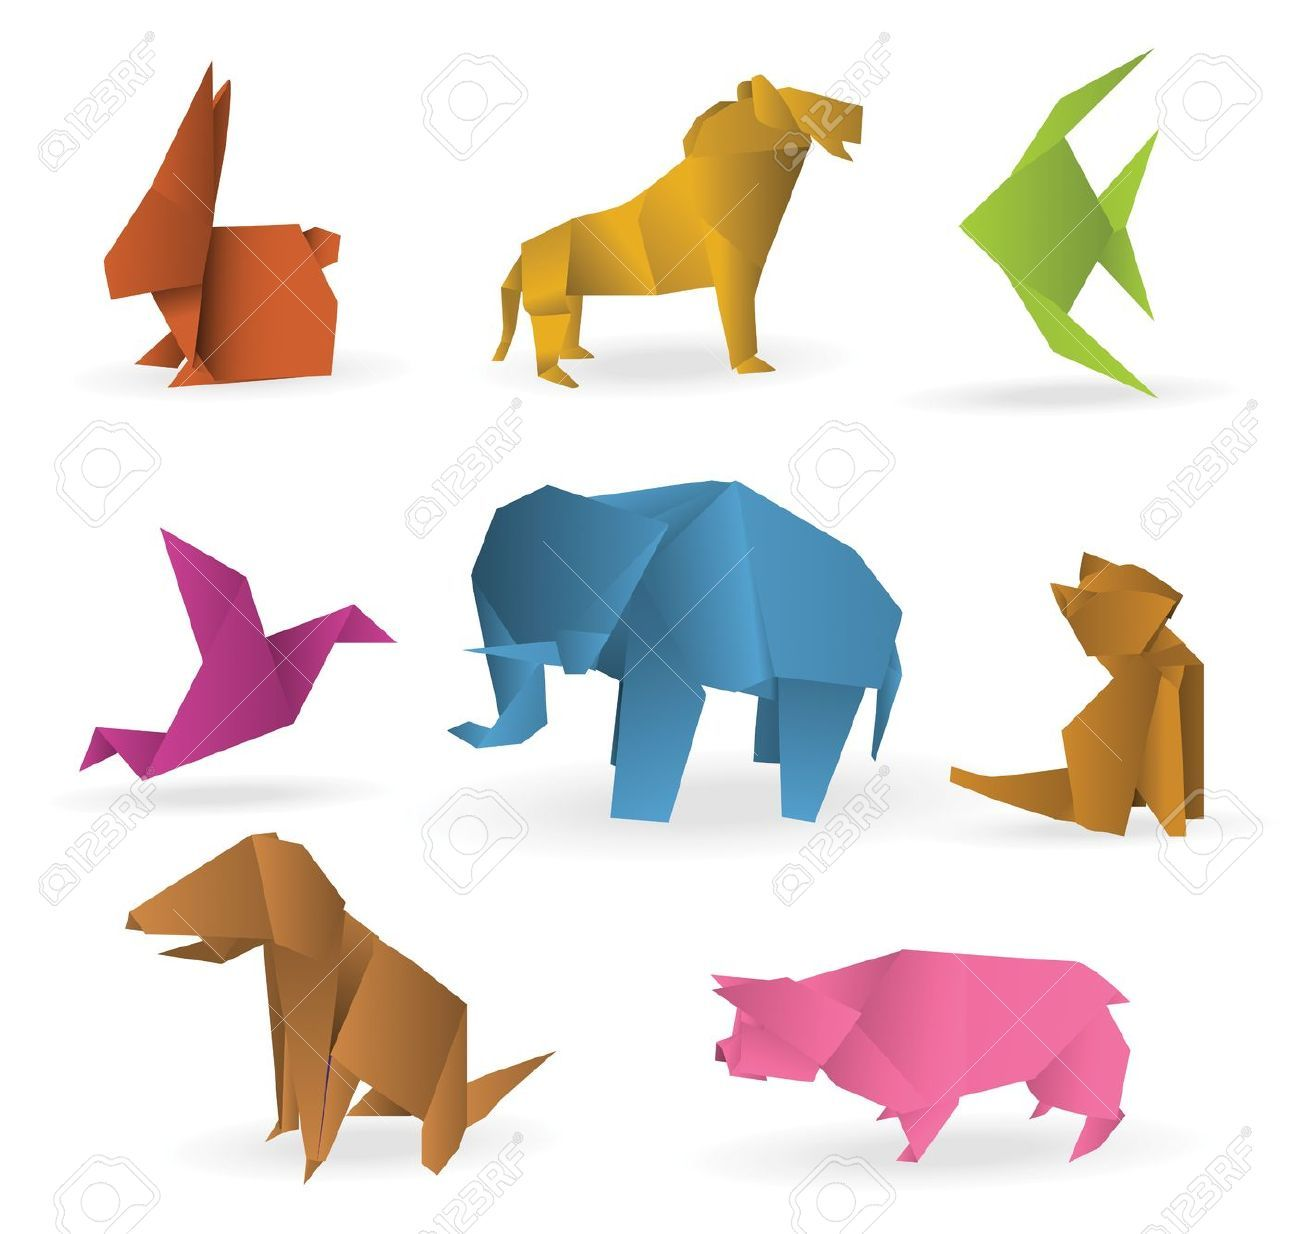 21823178-Origami-animals-Stock-Vector.jpg (1300×1234)